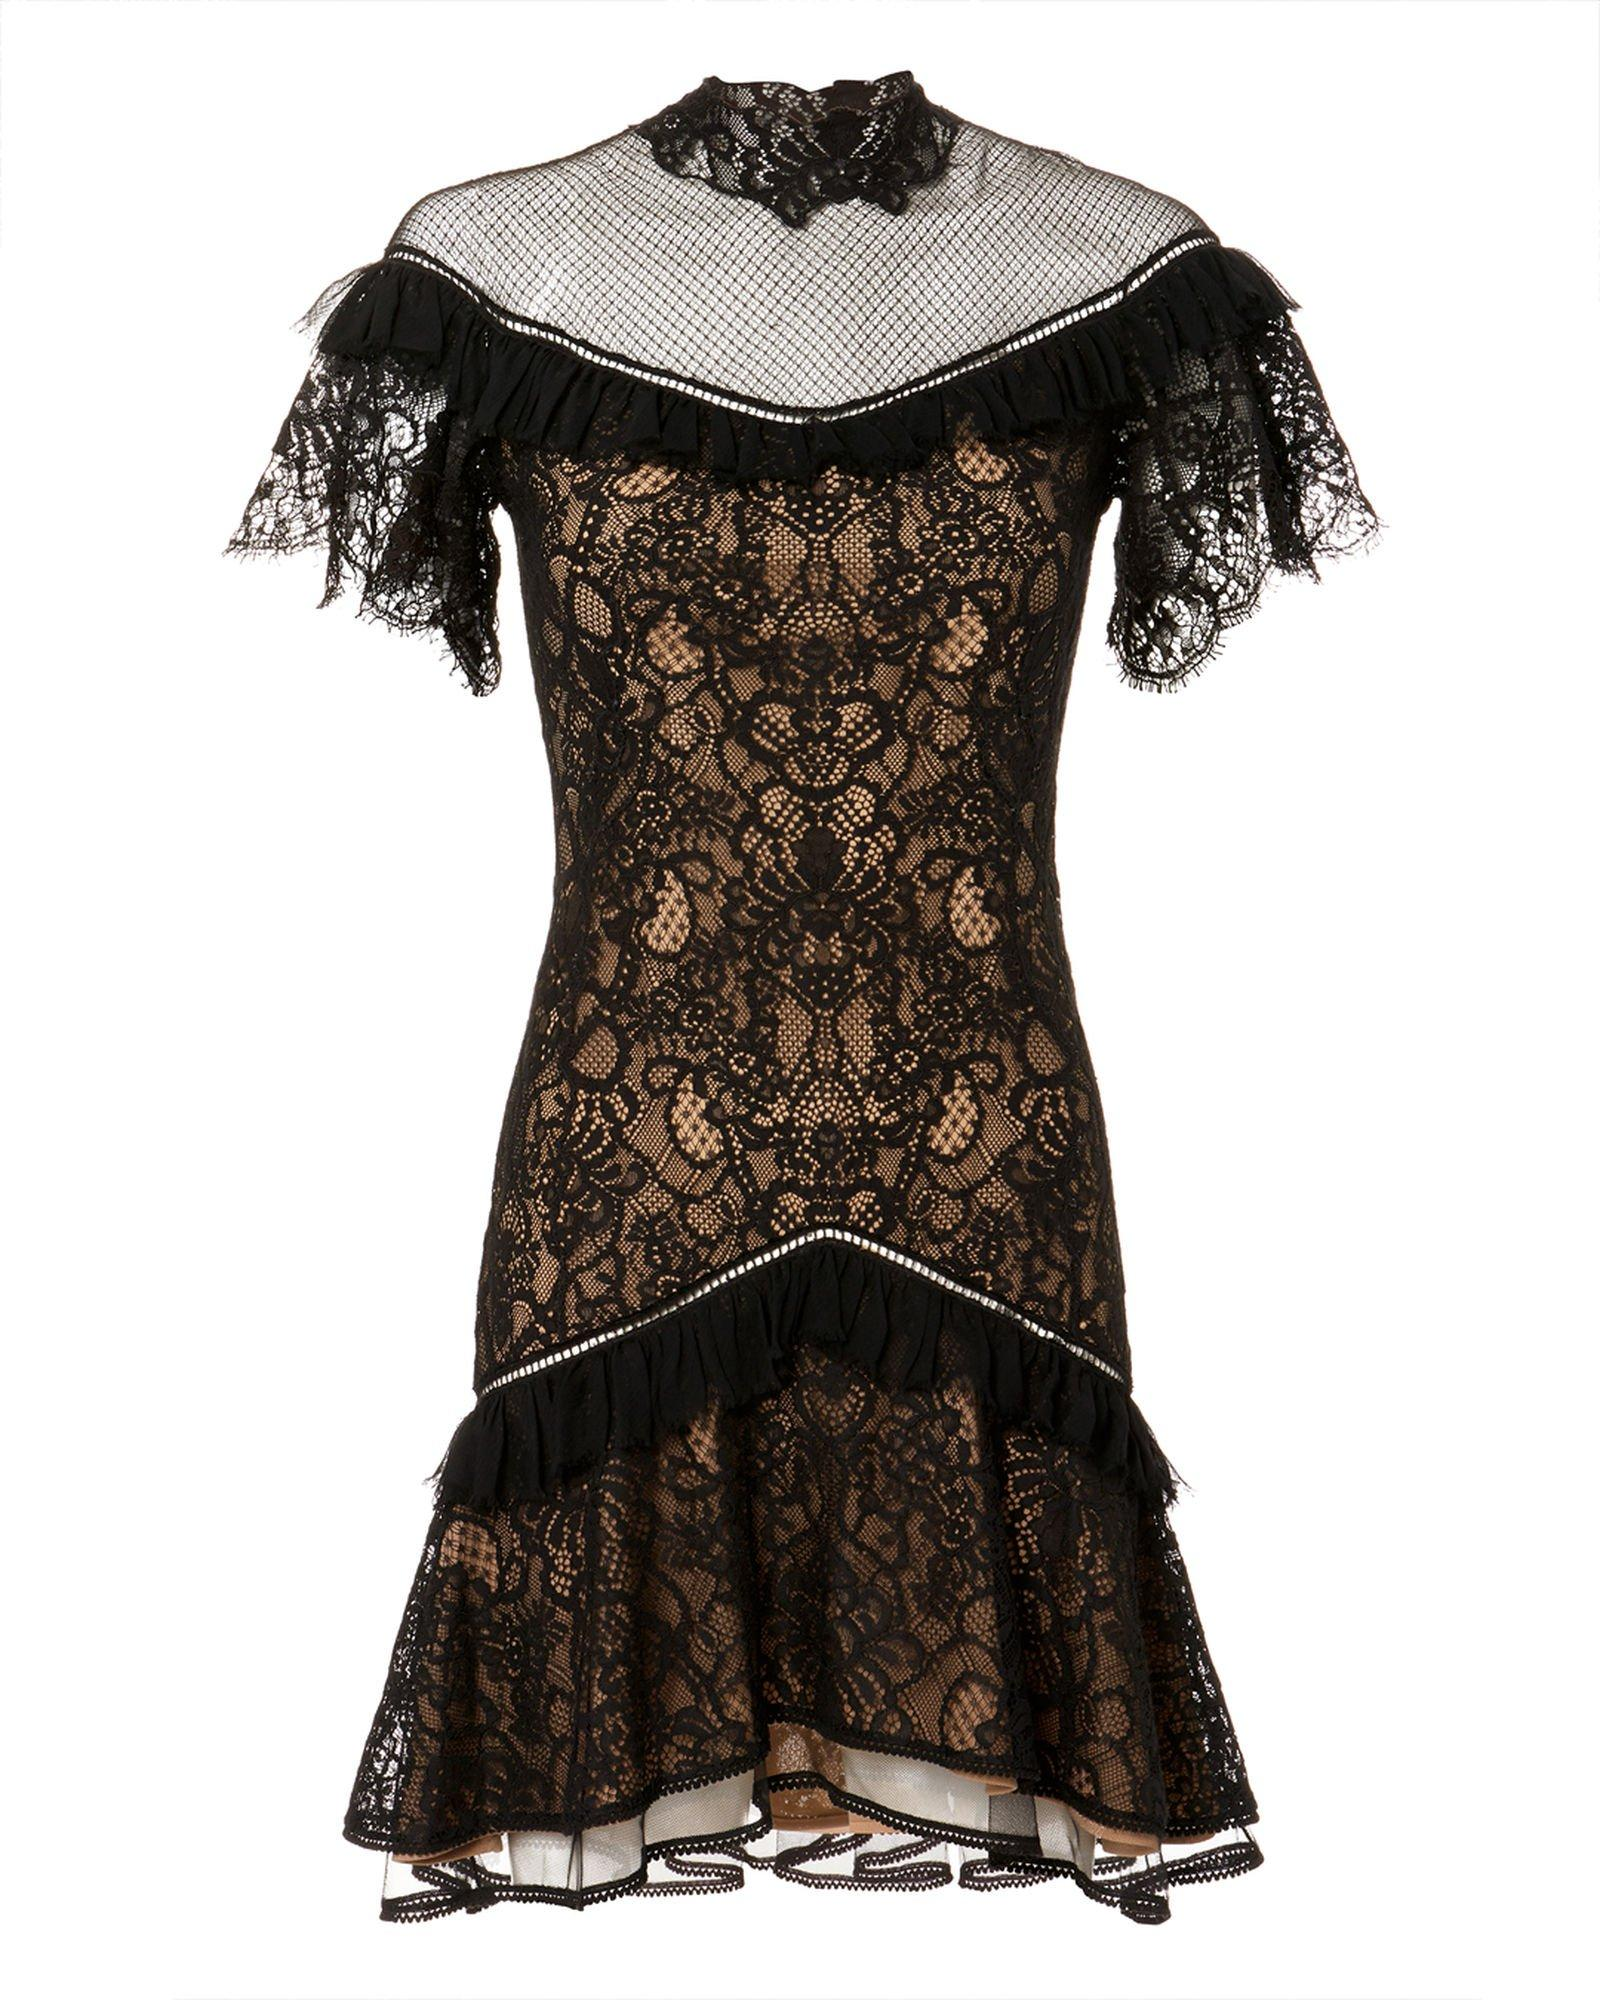 36a699a4a50 Jonathan Simkhai Mock-Neck Lace Ruffle Short Dress In Black | ModeSens